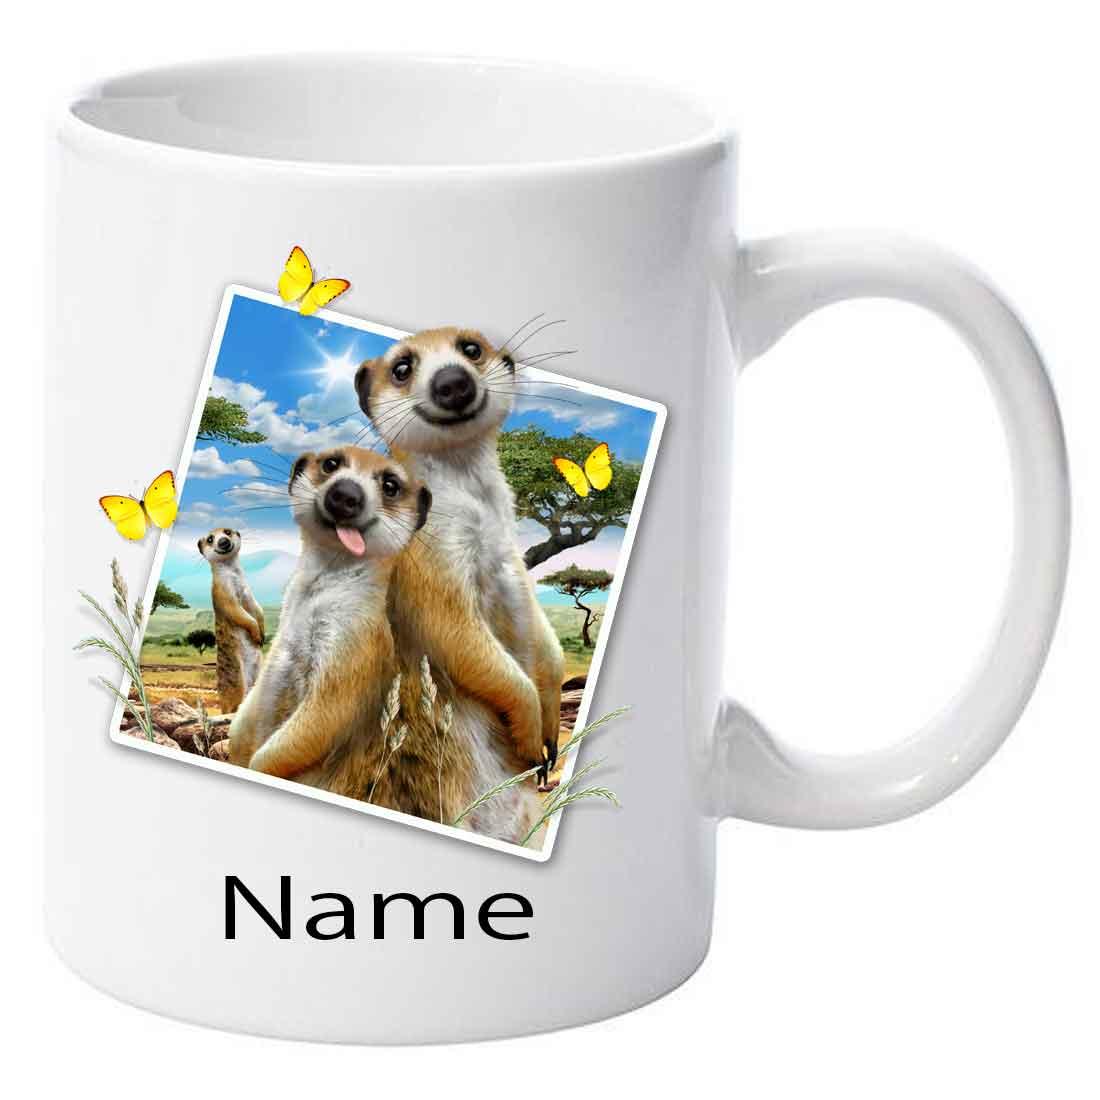 Personalised Meerkats Selfie Printed Ceramic Mug